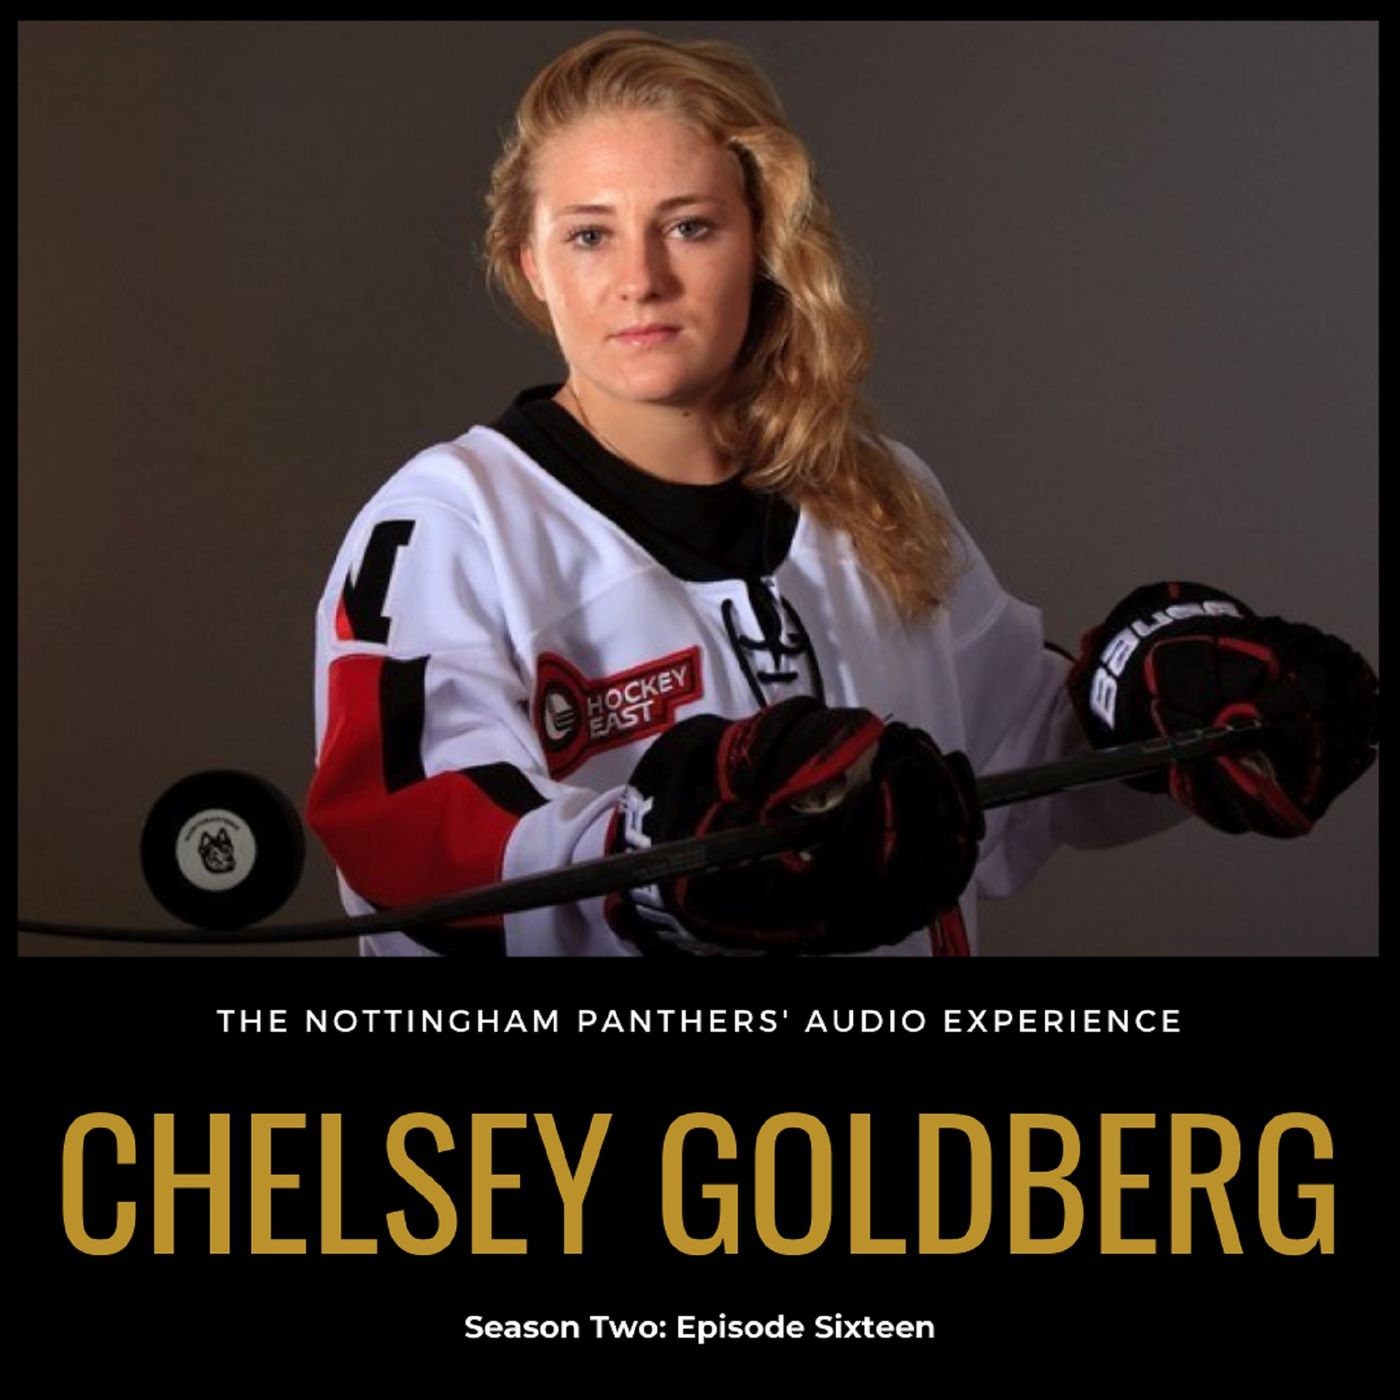 Chelsey Goldberg   Season Two: Episode Sixteen